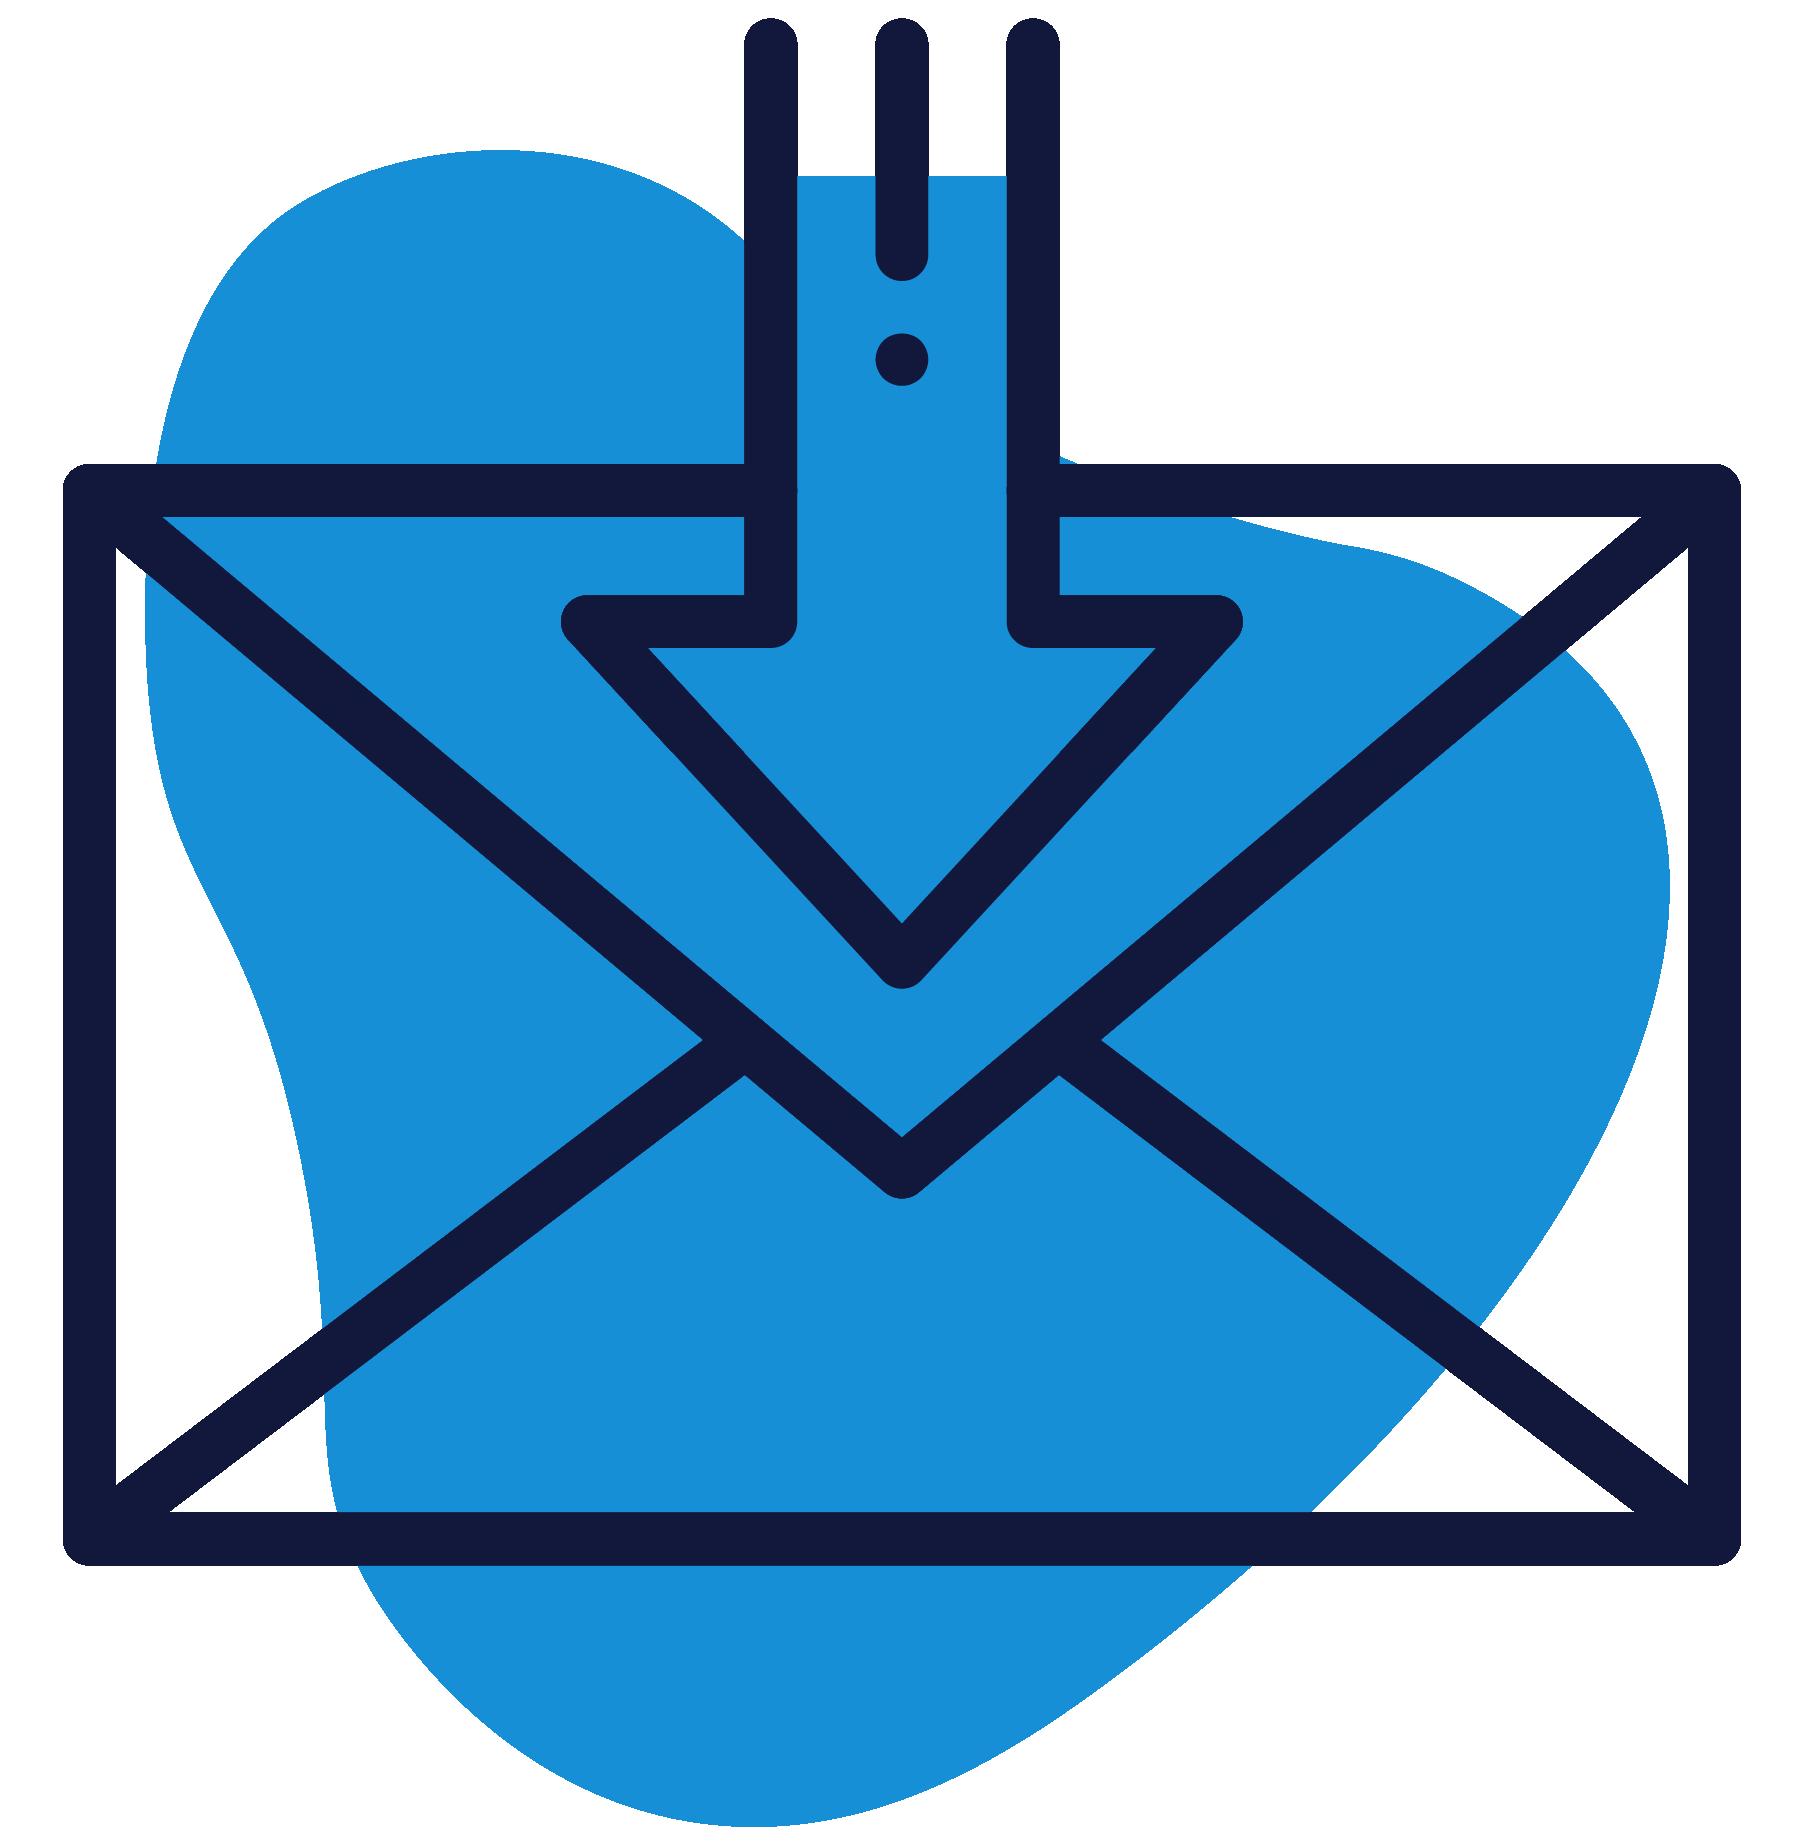 E-mail, pošta, - kontaktujte nás.